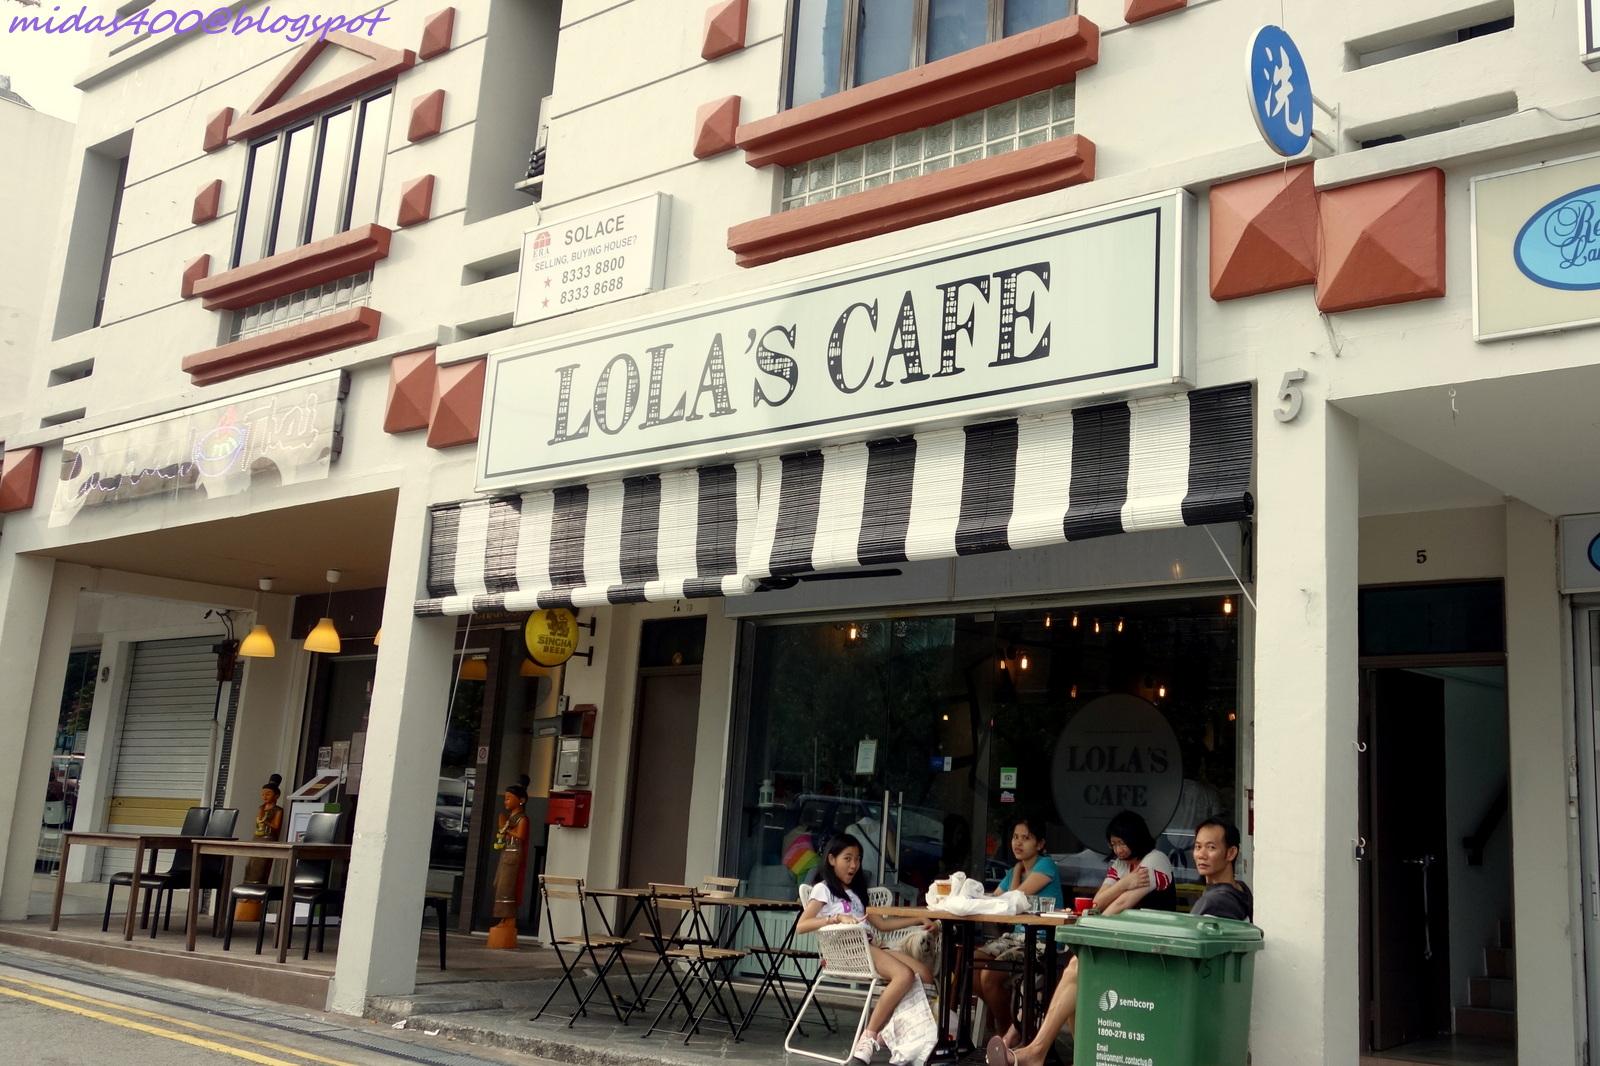 Midas Food n Travel Blog: Dinner at Lola's Cafe